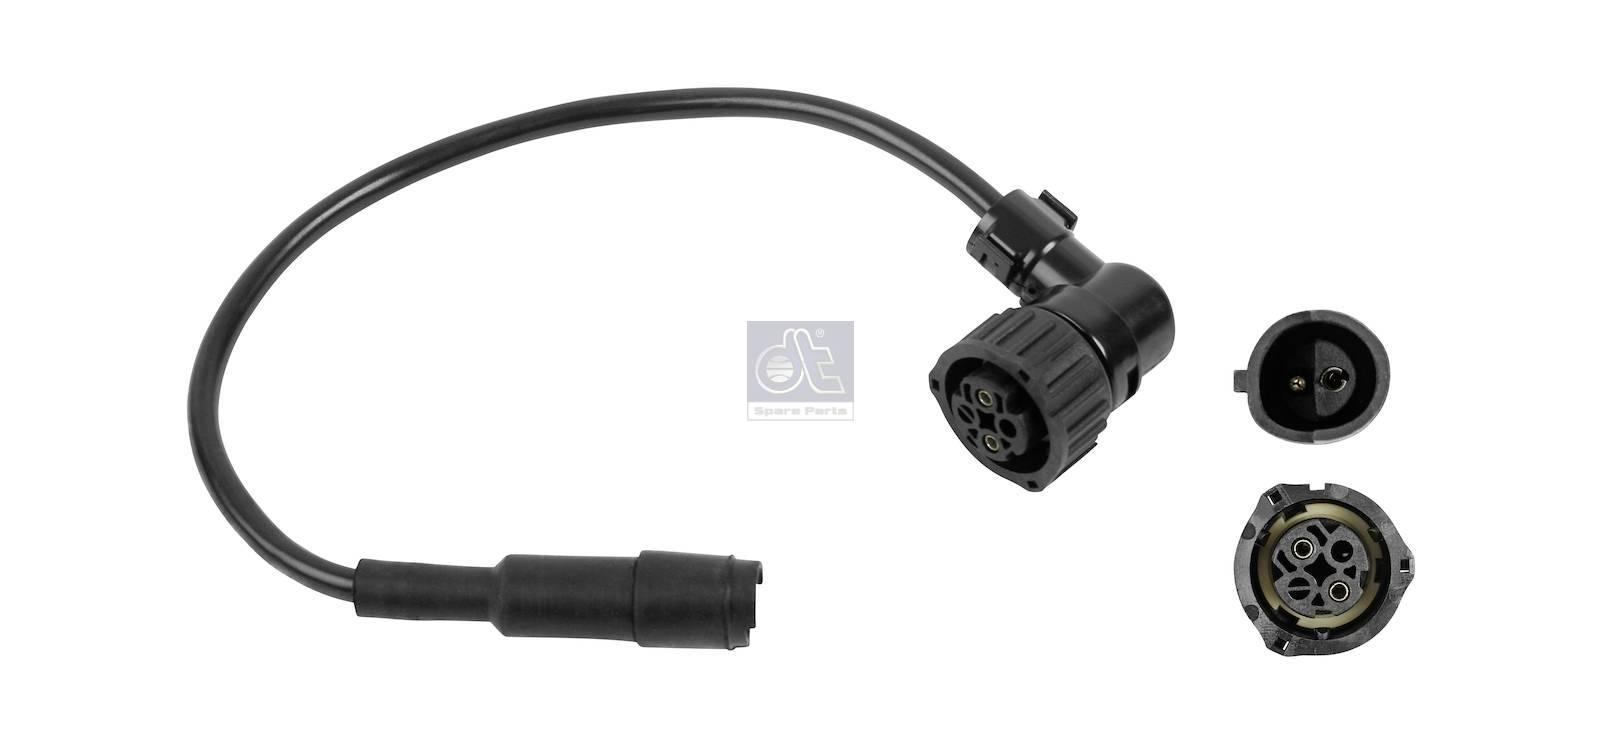 Adapter cable, fuel level sensor